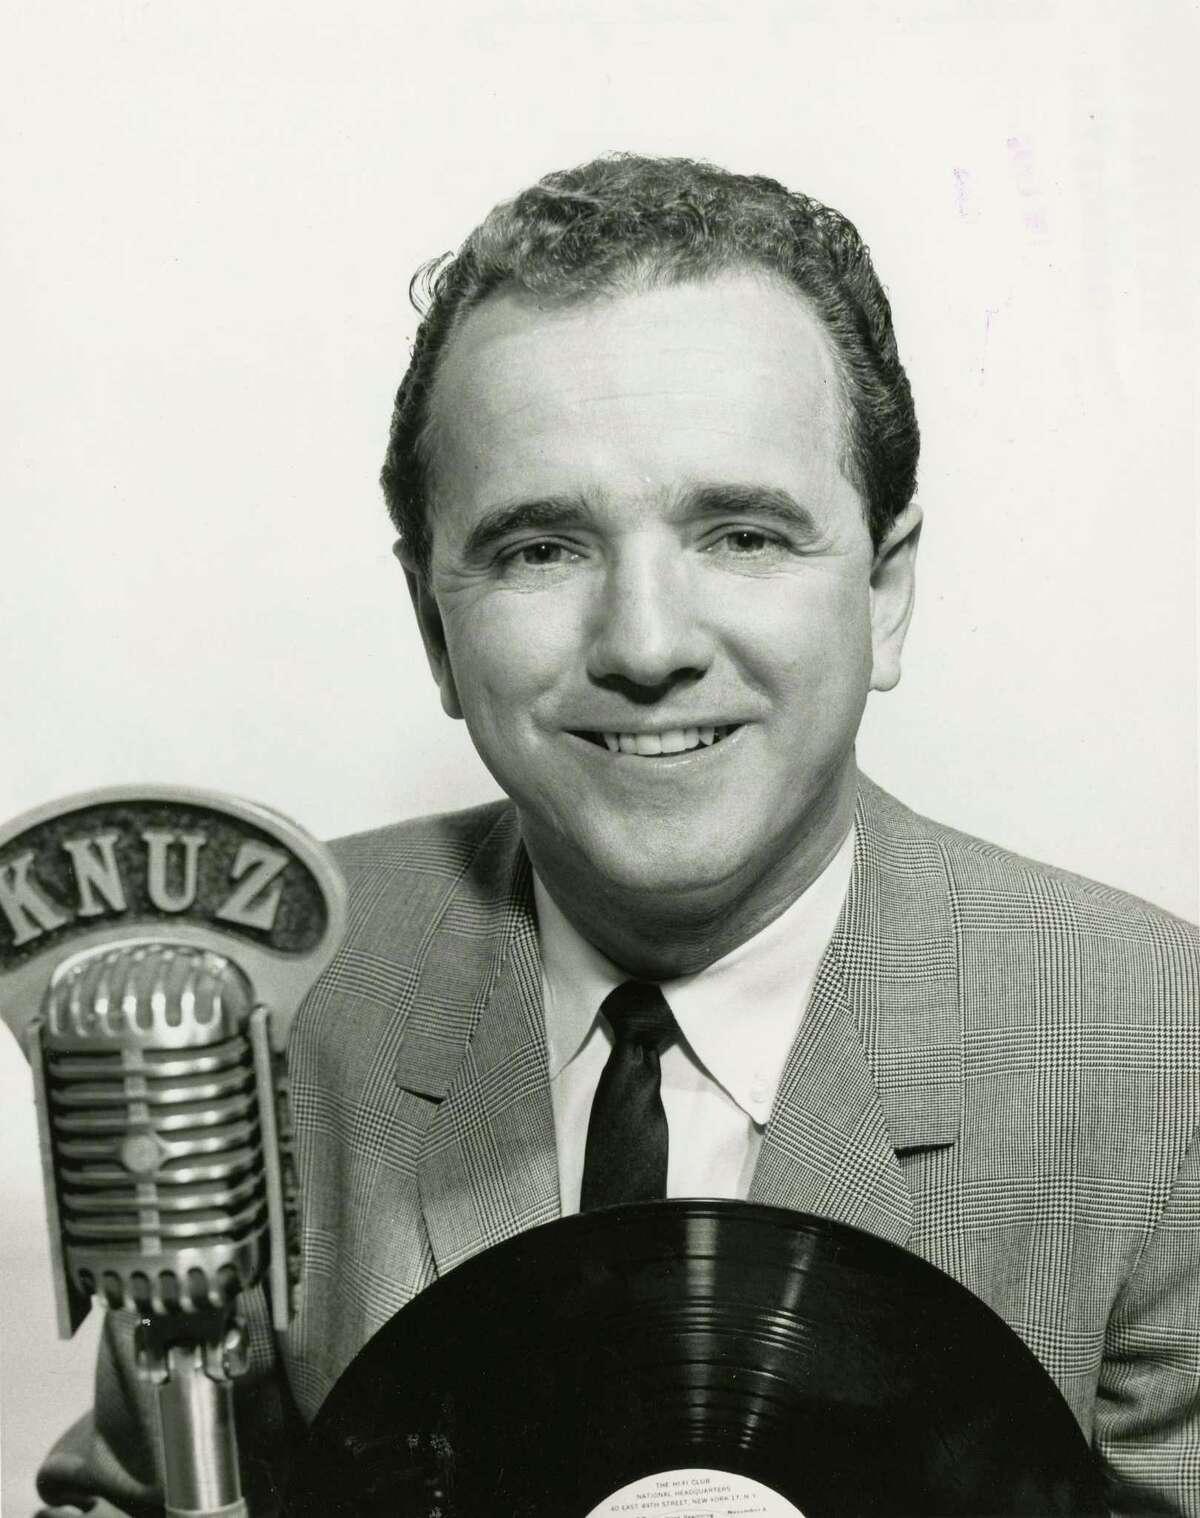 Paul Berlin, KNUZ disk jockey (1964)